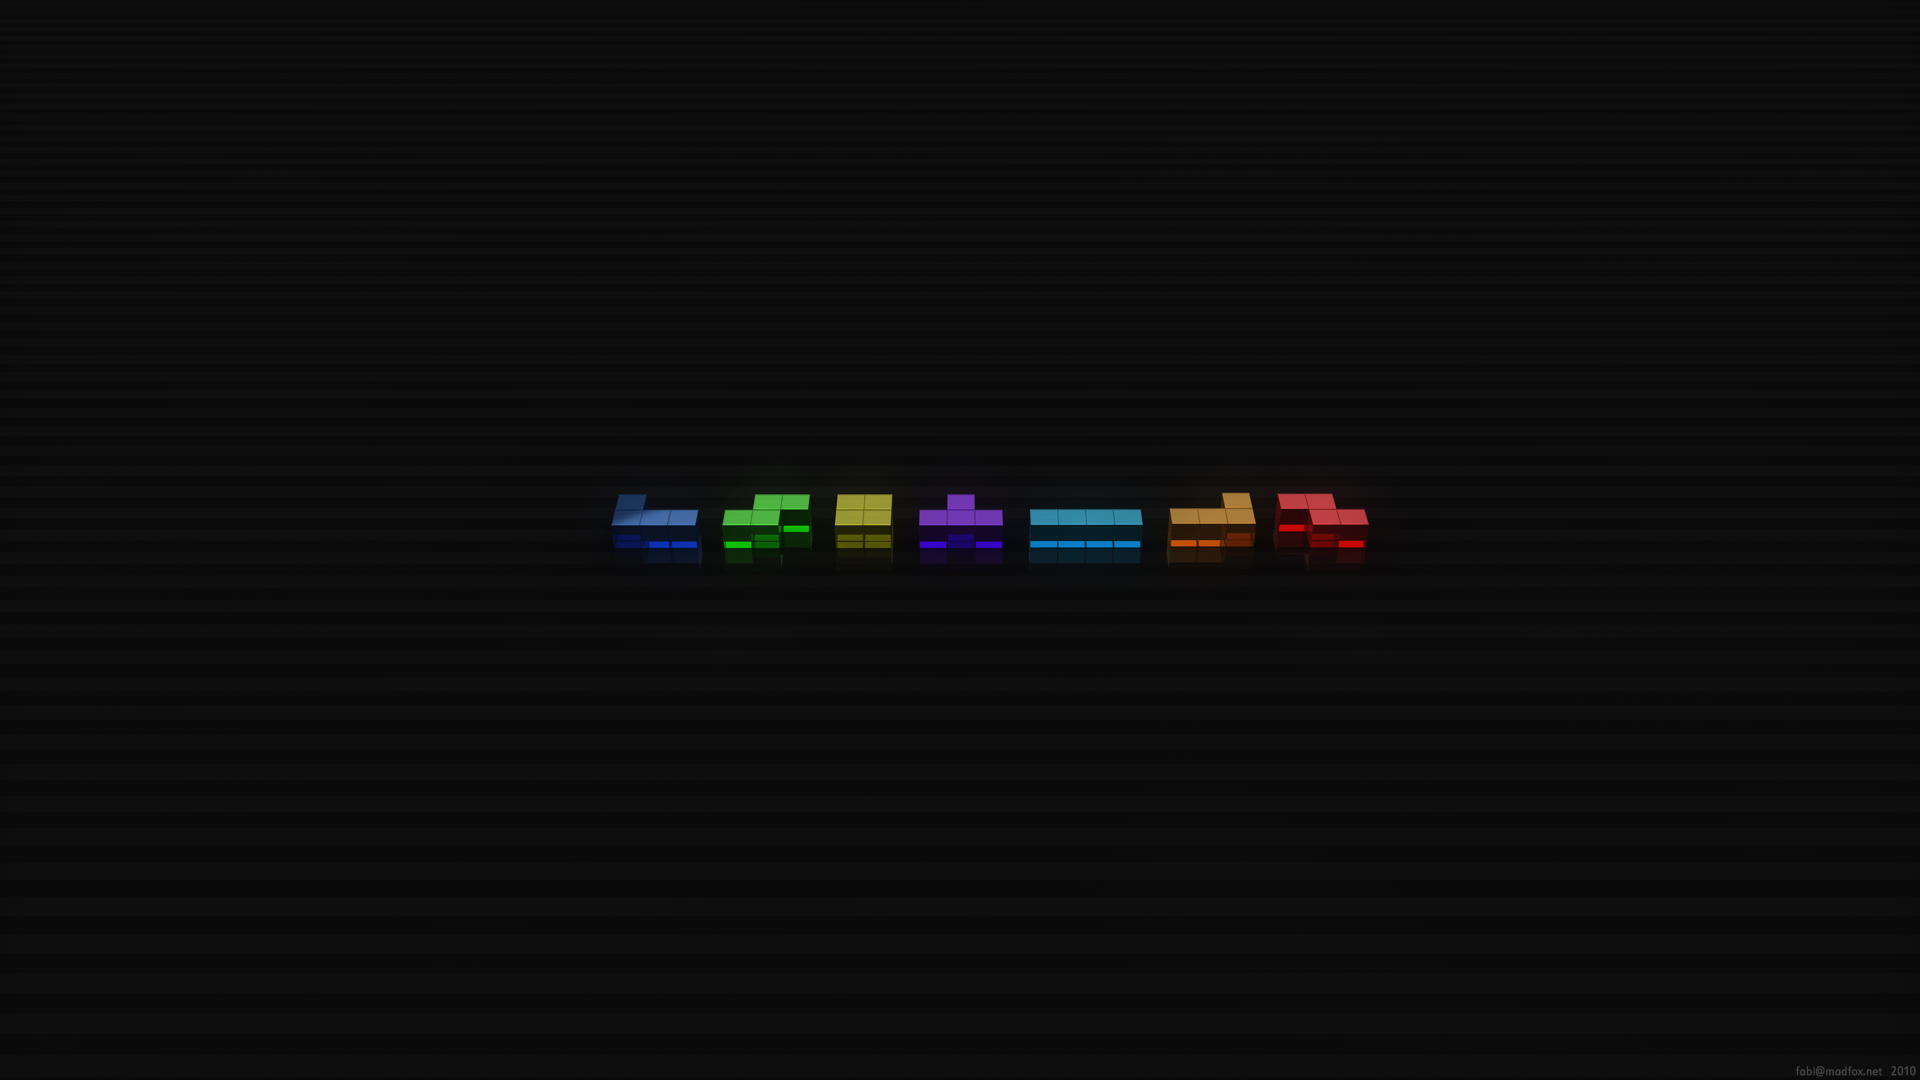 Tetris HD Wallpaper Background Image 1920x1080 ID333876 1920x1080